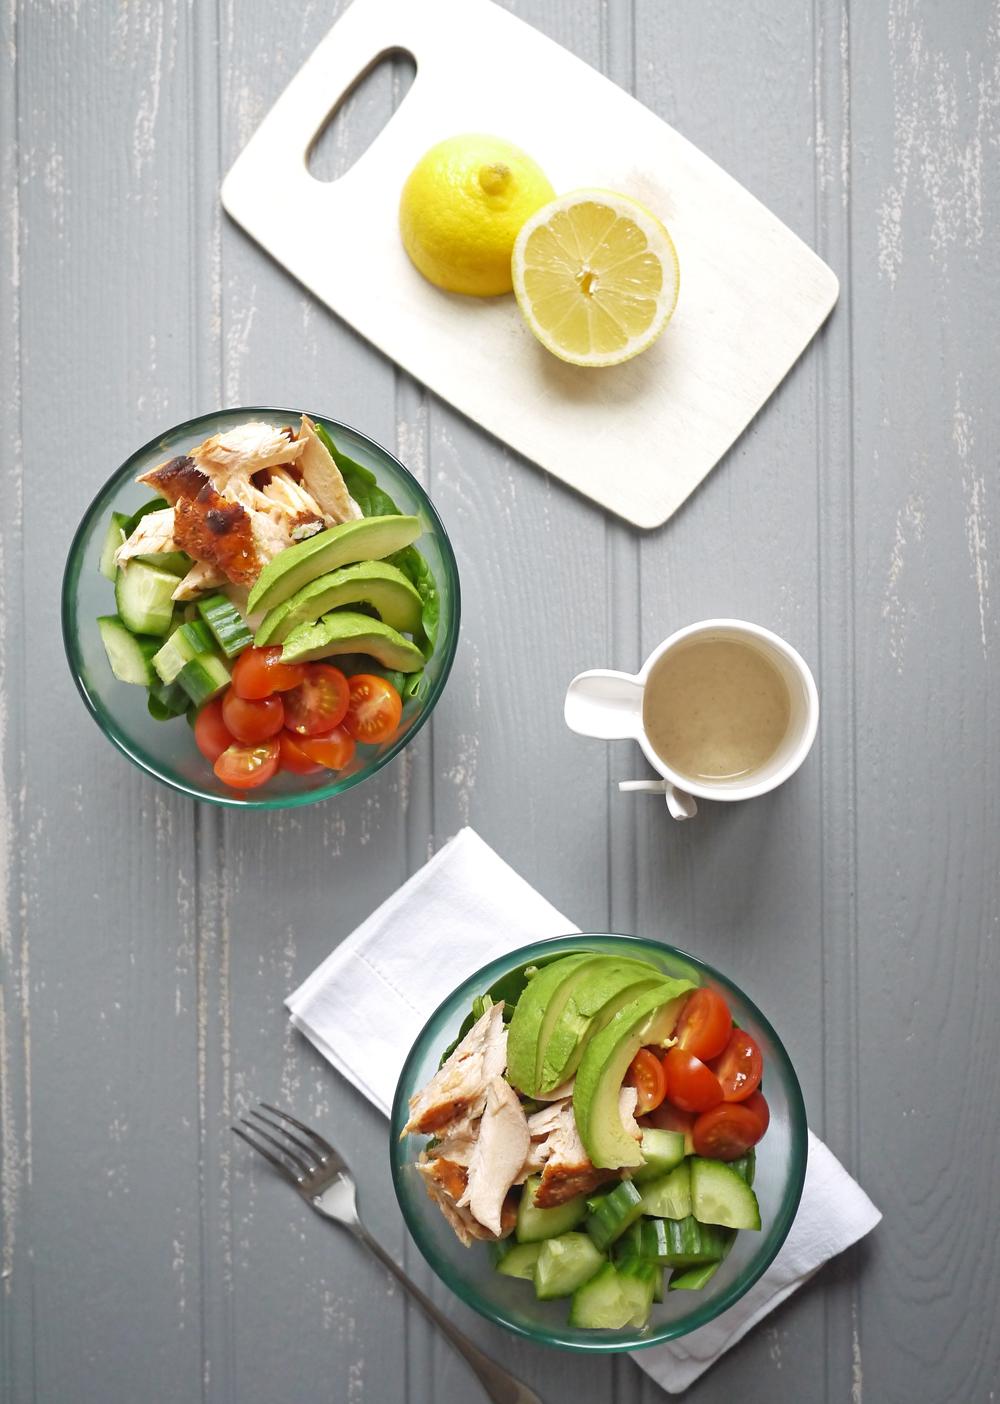 Salmon Salad with Lemon Tahini Dressing Overhead